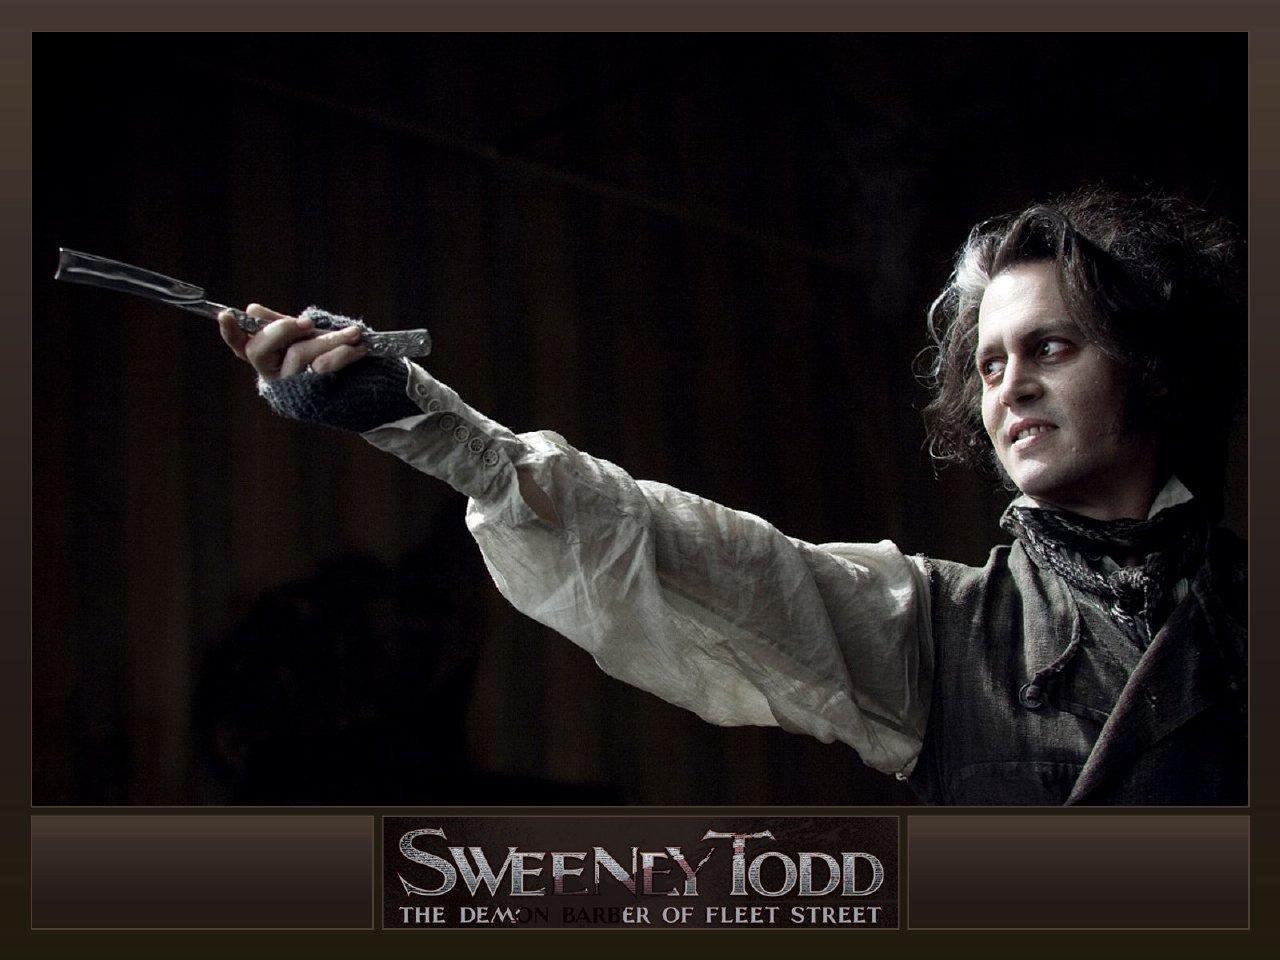 ST-sweeney-todd-5307907-1280-960.jpg